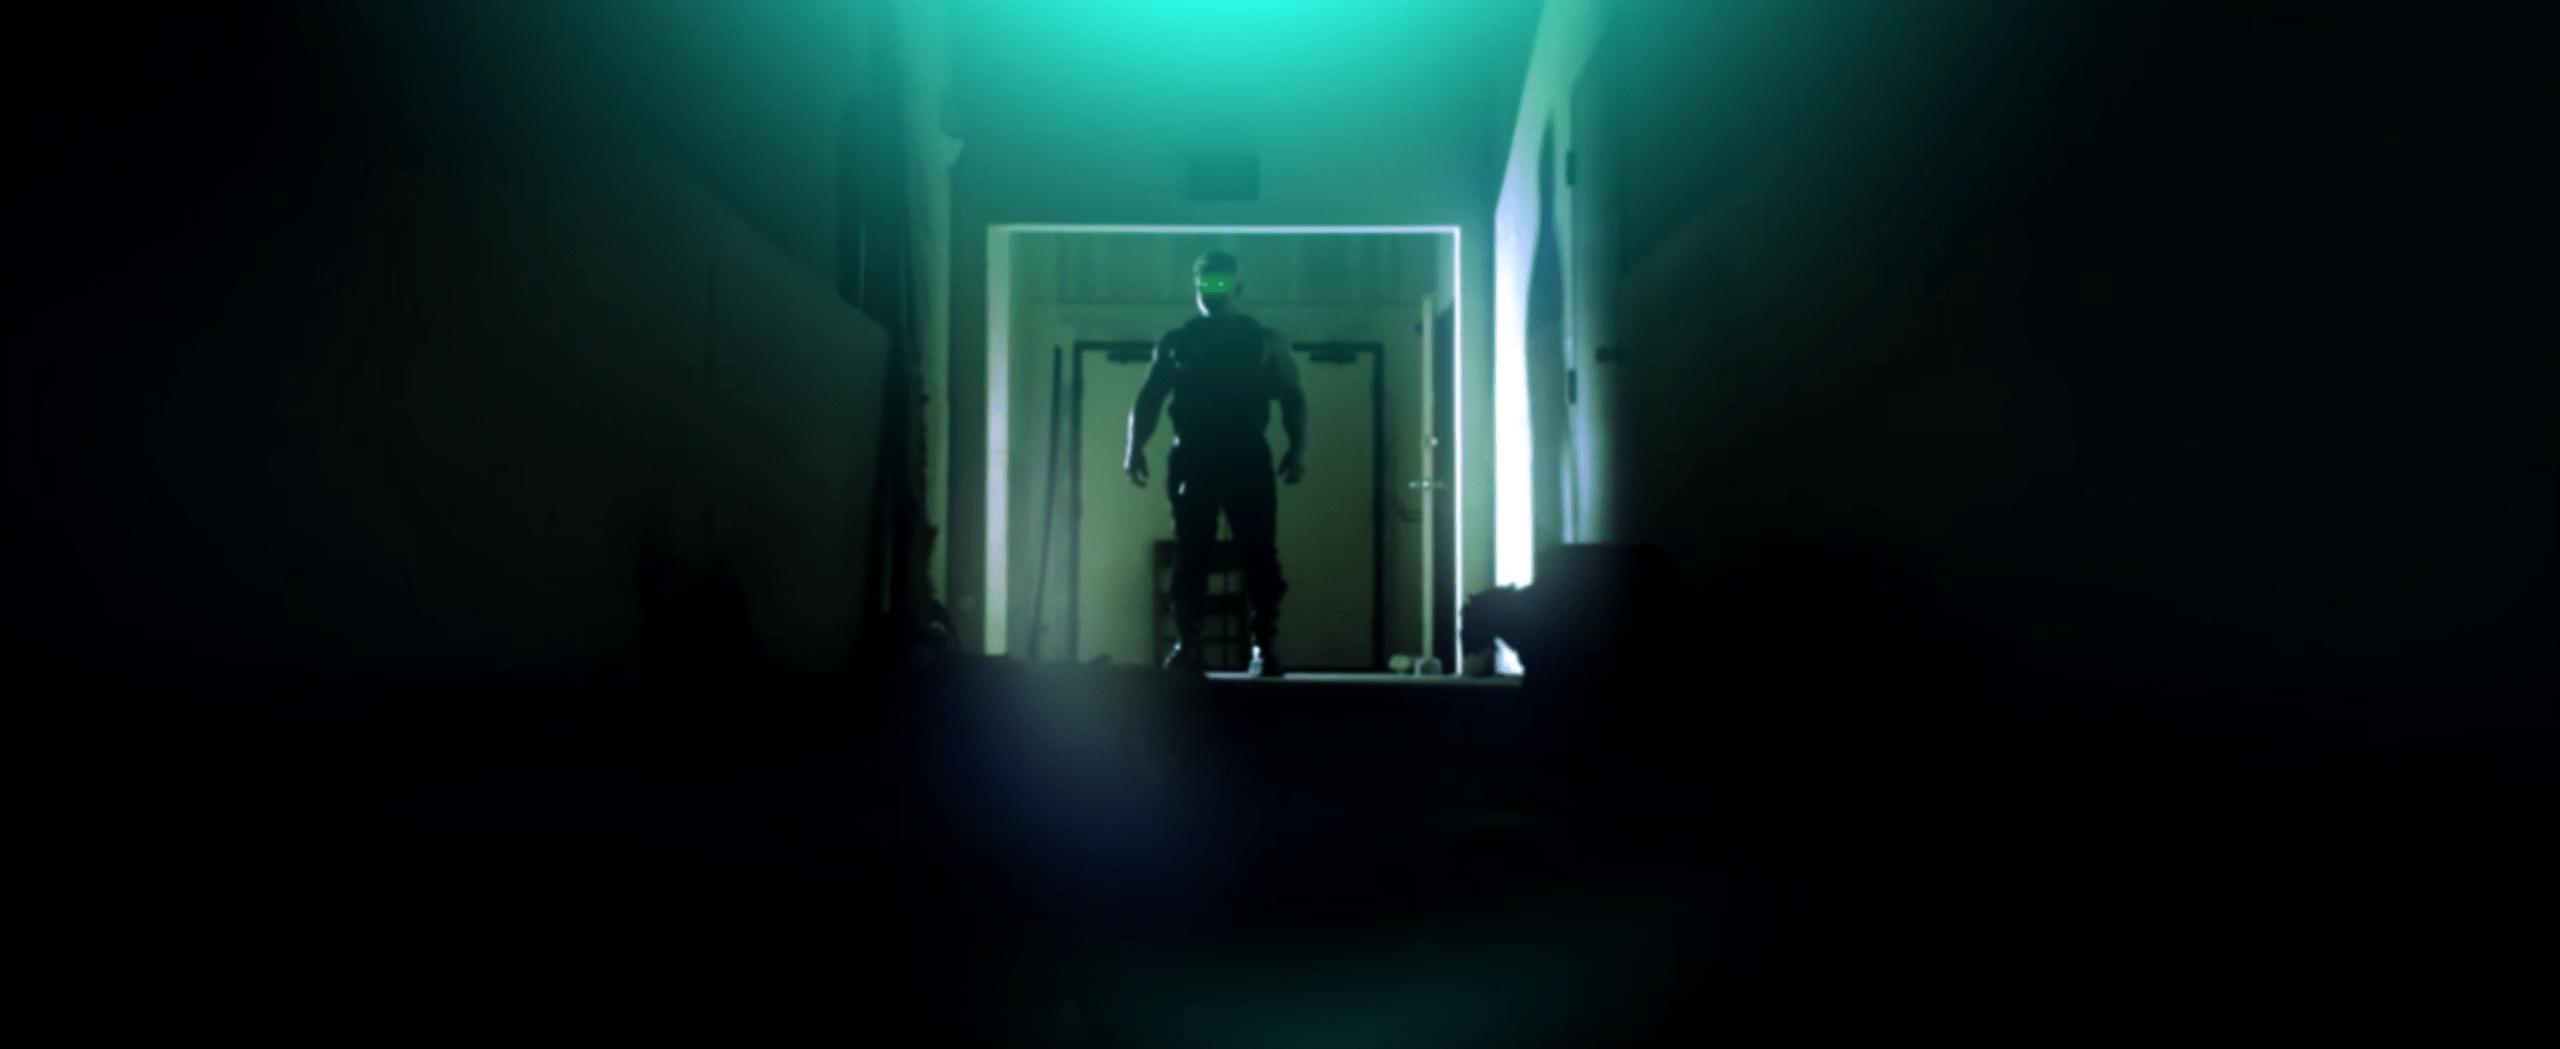 Zombie Duke Nukem with glowing eyes walking down a dark hallway